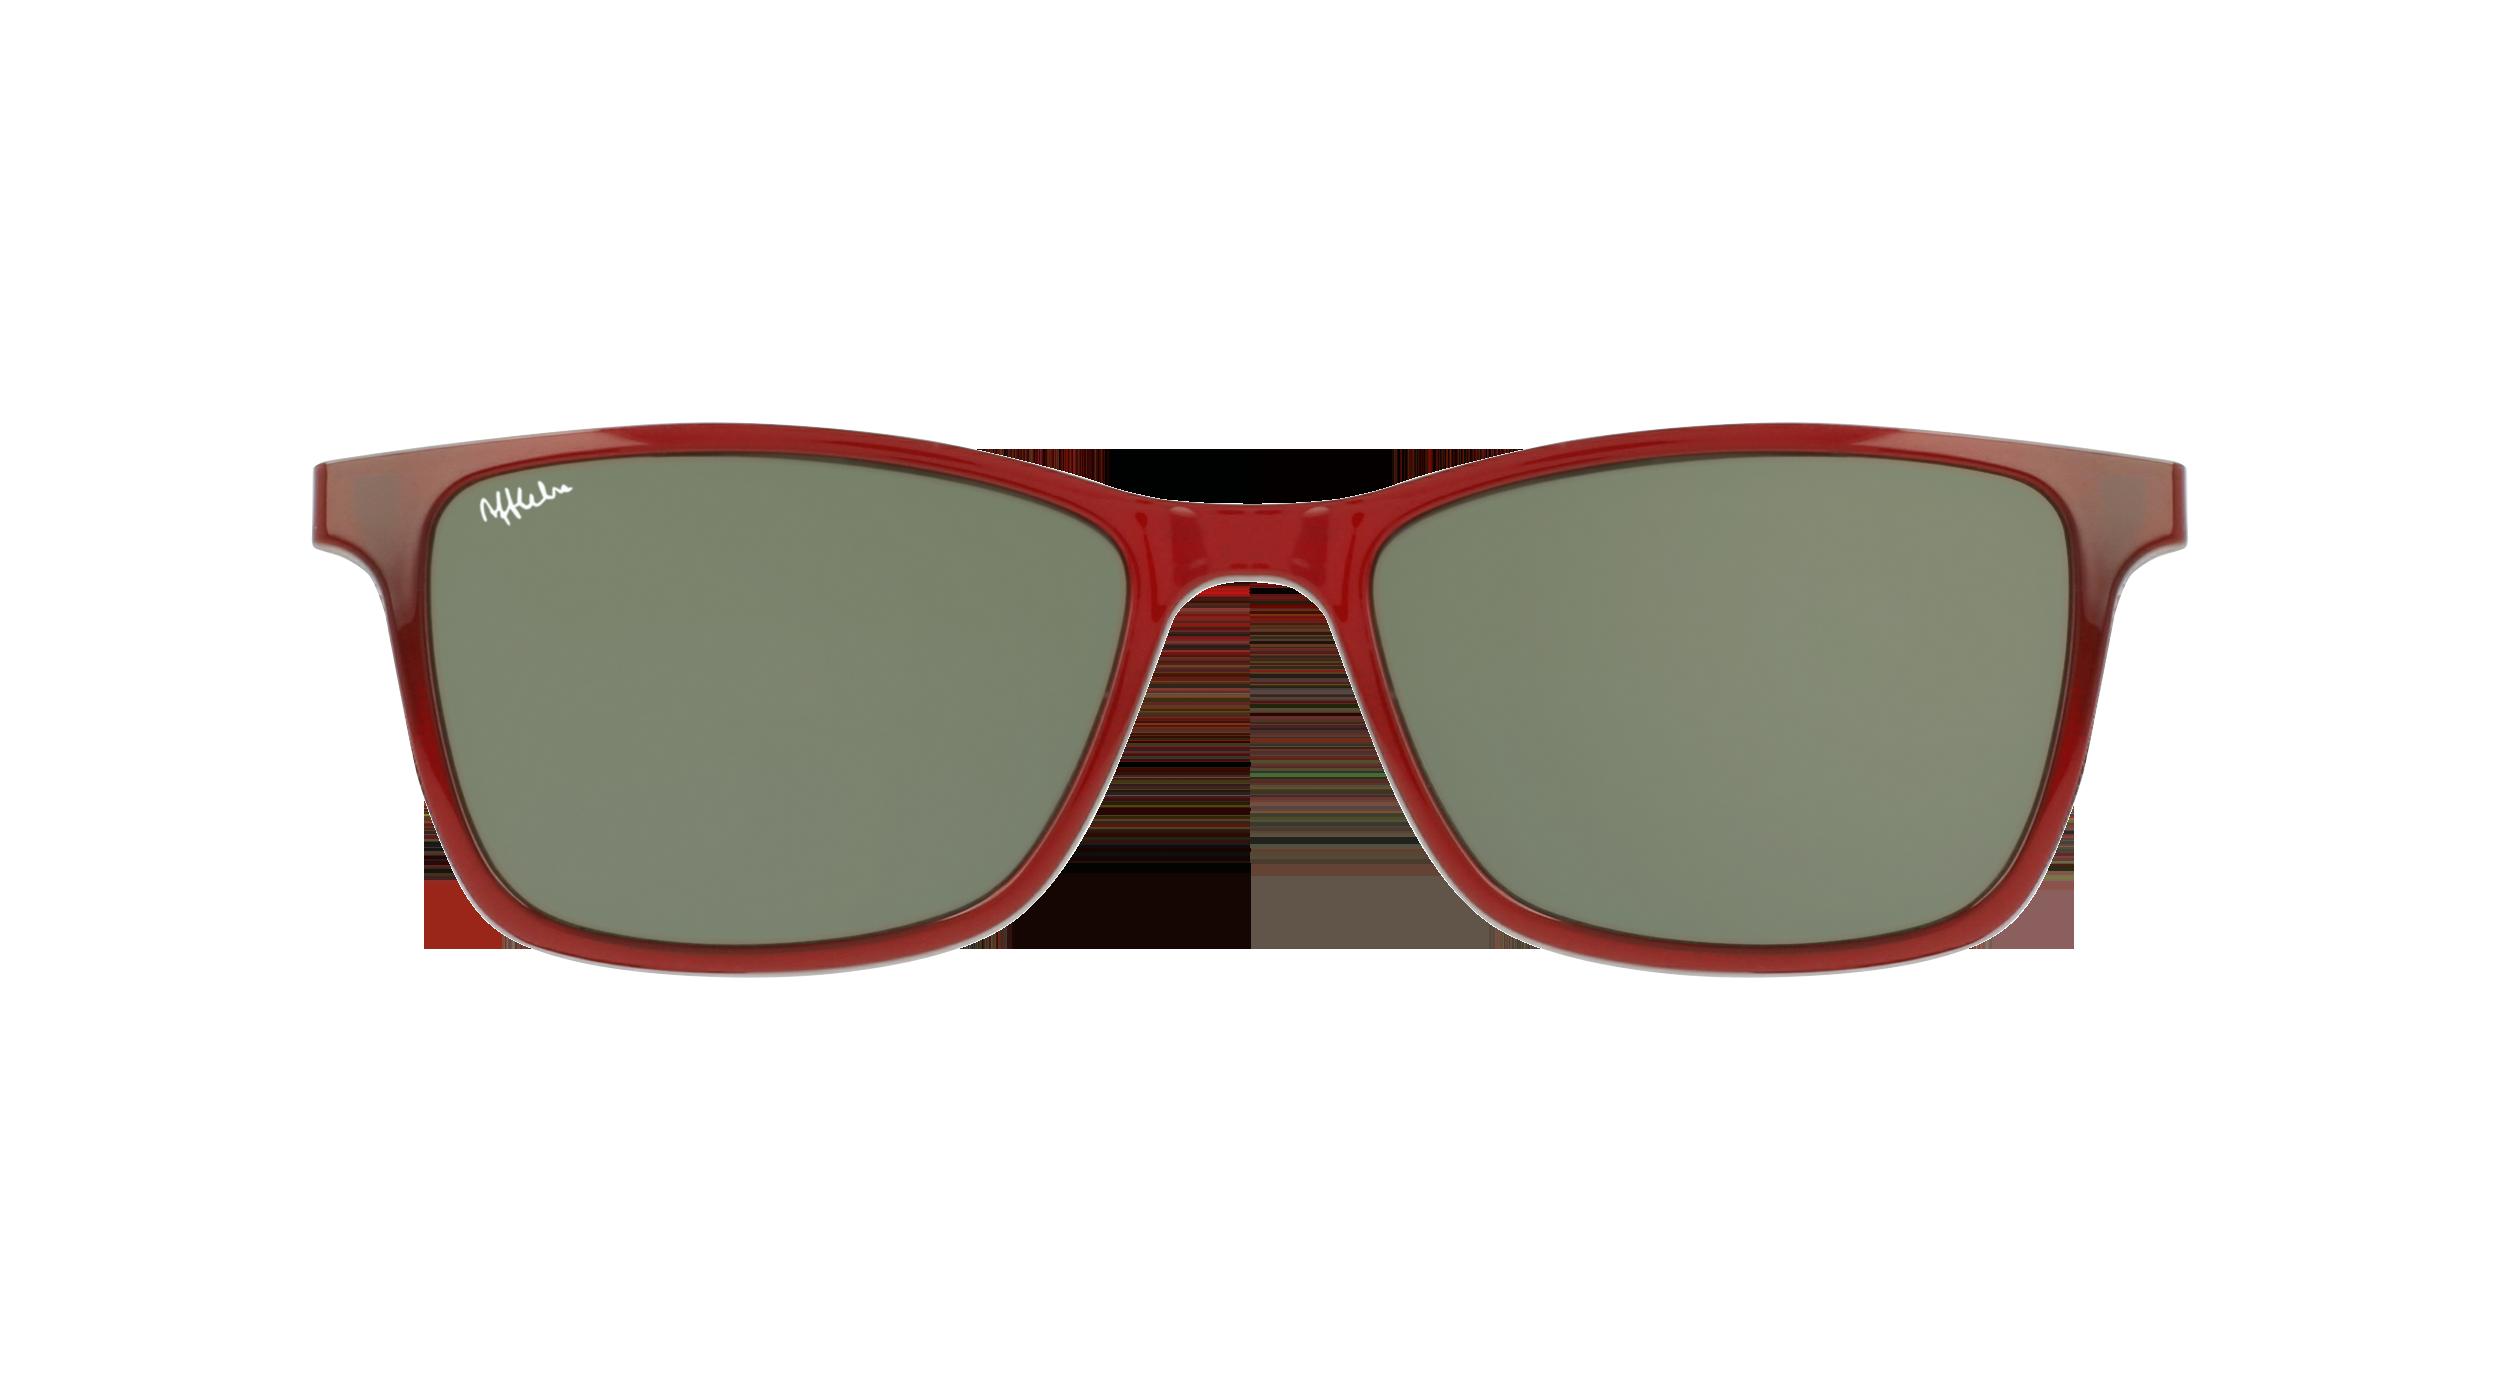 afflelou/france/products/smart_clip/clips_glasses/07630036457702.png